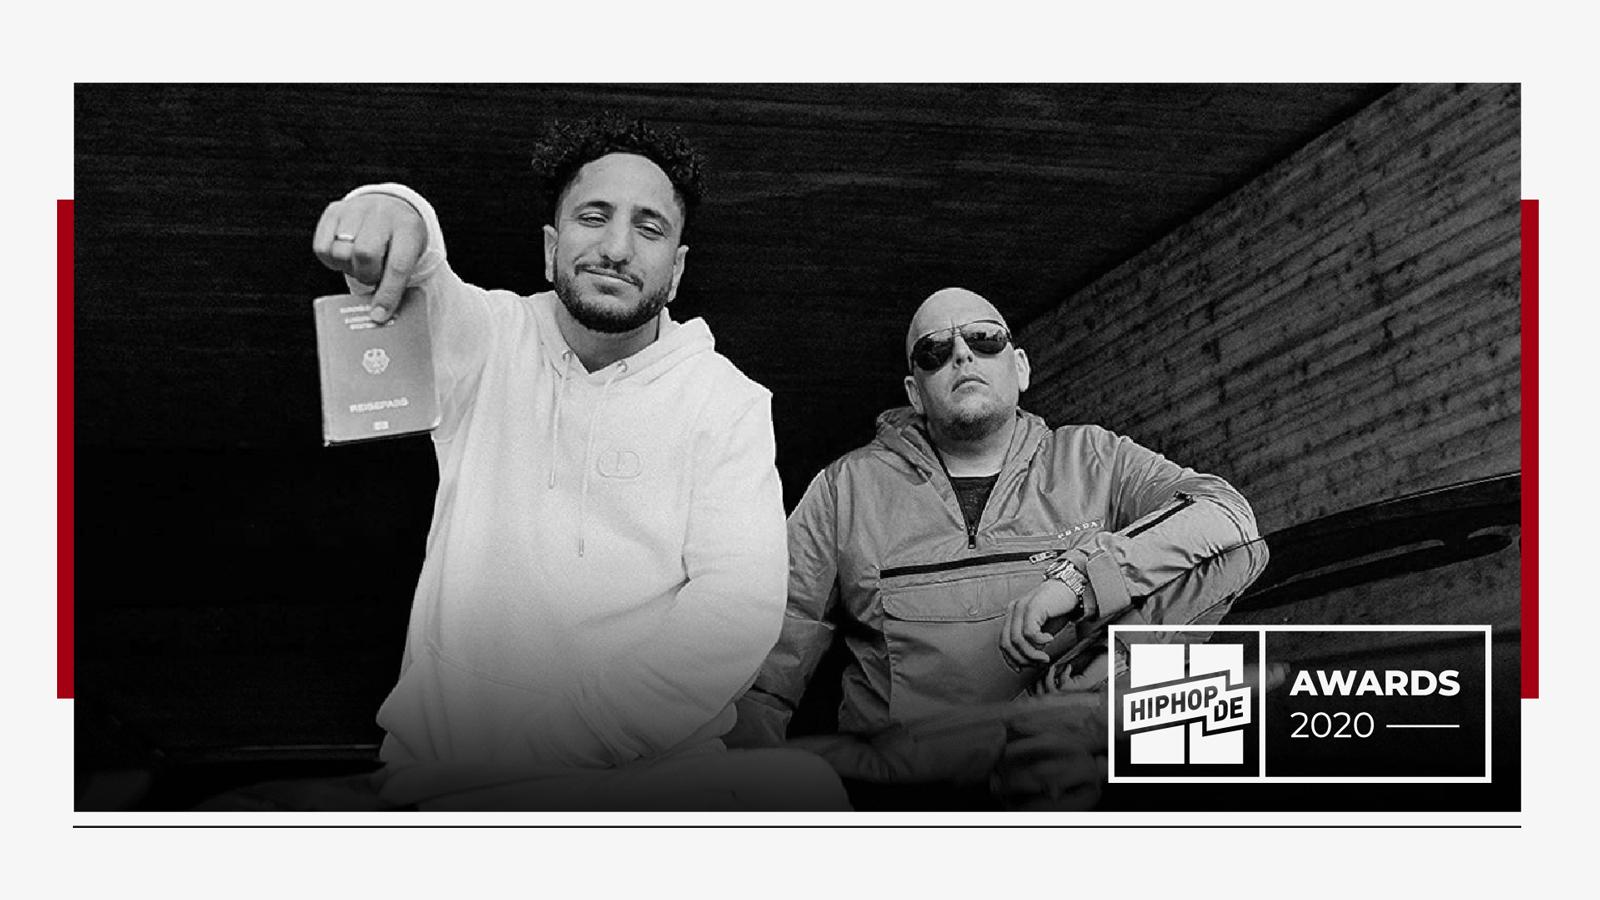 Wie Celo & Abdi ihre Straßenrap Legacy fortführen – Hiphop.de Awards 2020